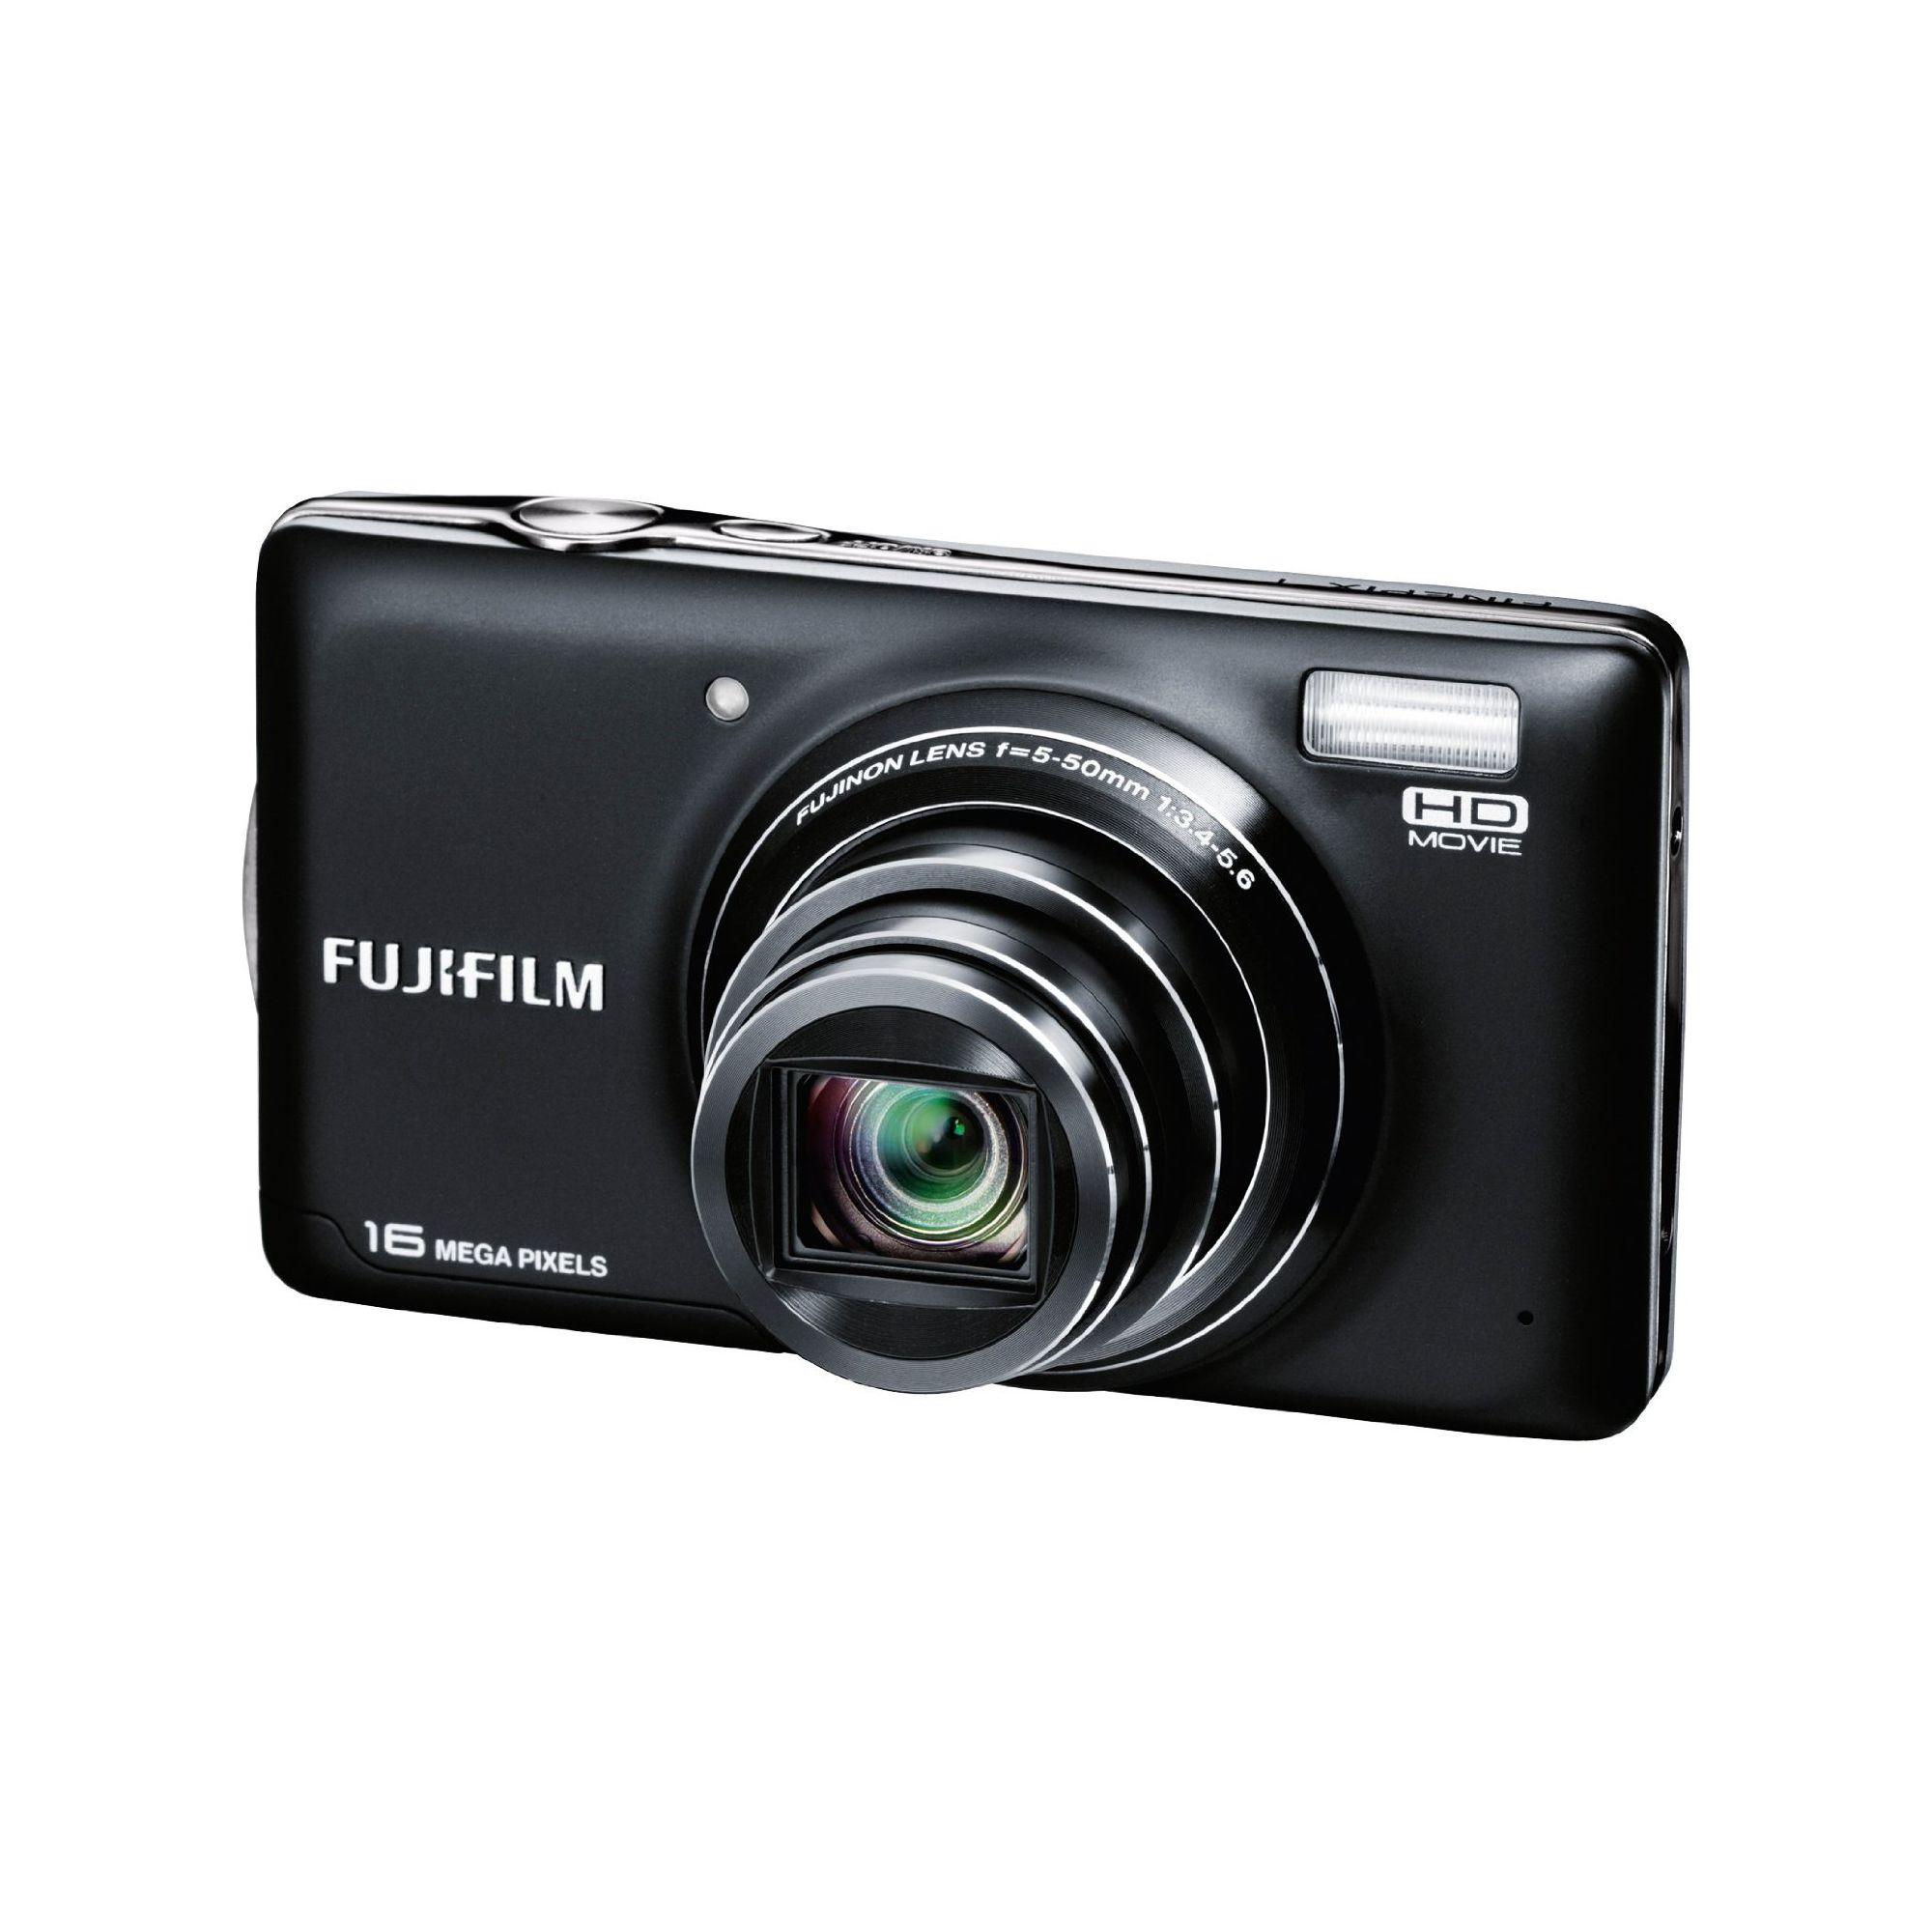 Fuji FinePix T400 Digital Camera, Black, 16MP, 10x Optical Zoom, 3.0 inch LCD Screen